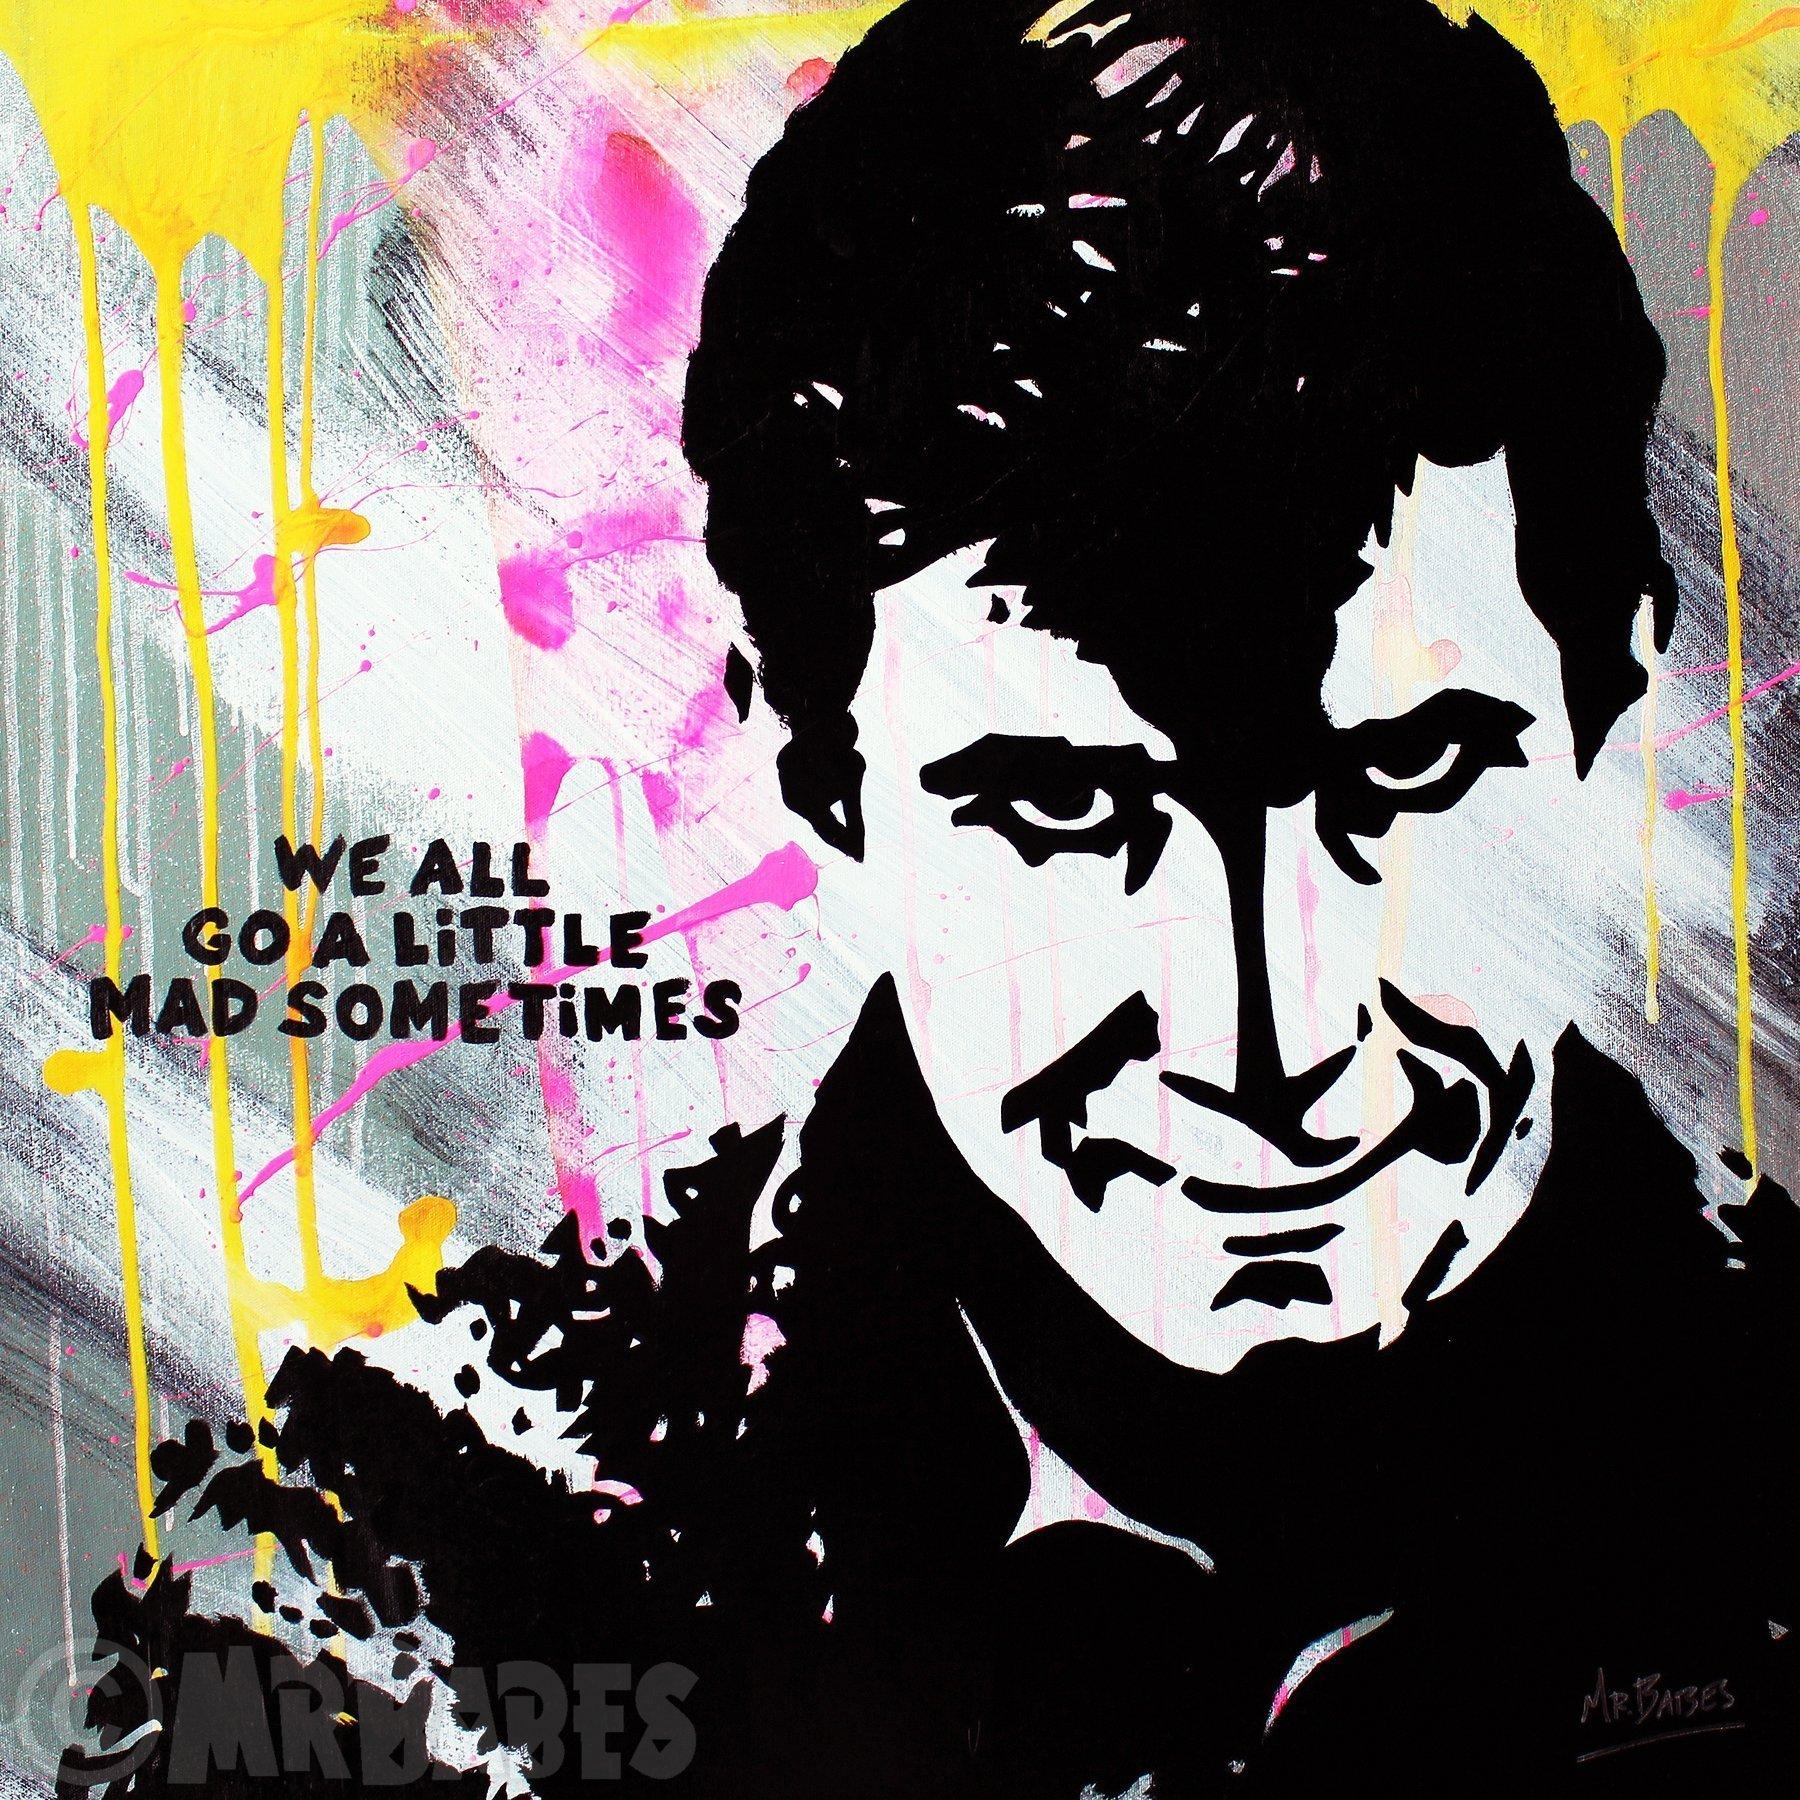 MR.BABES - ''Psycho: Norman Bates (Anthony Perkins)'' - Original Pop Art Painting - Movie Portrait